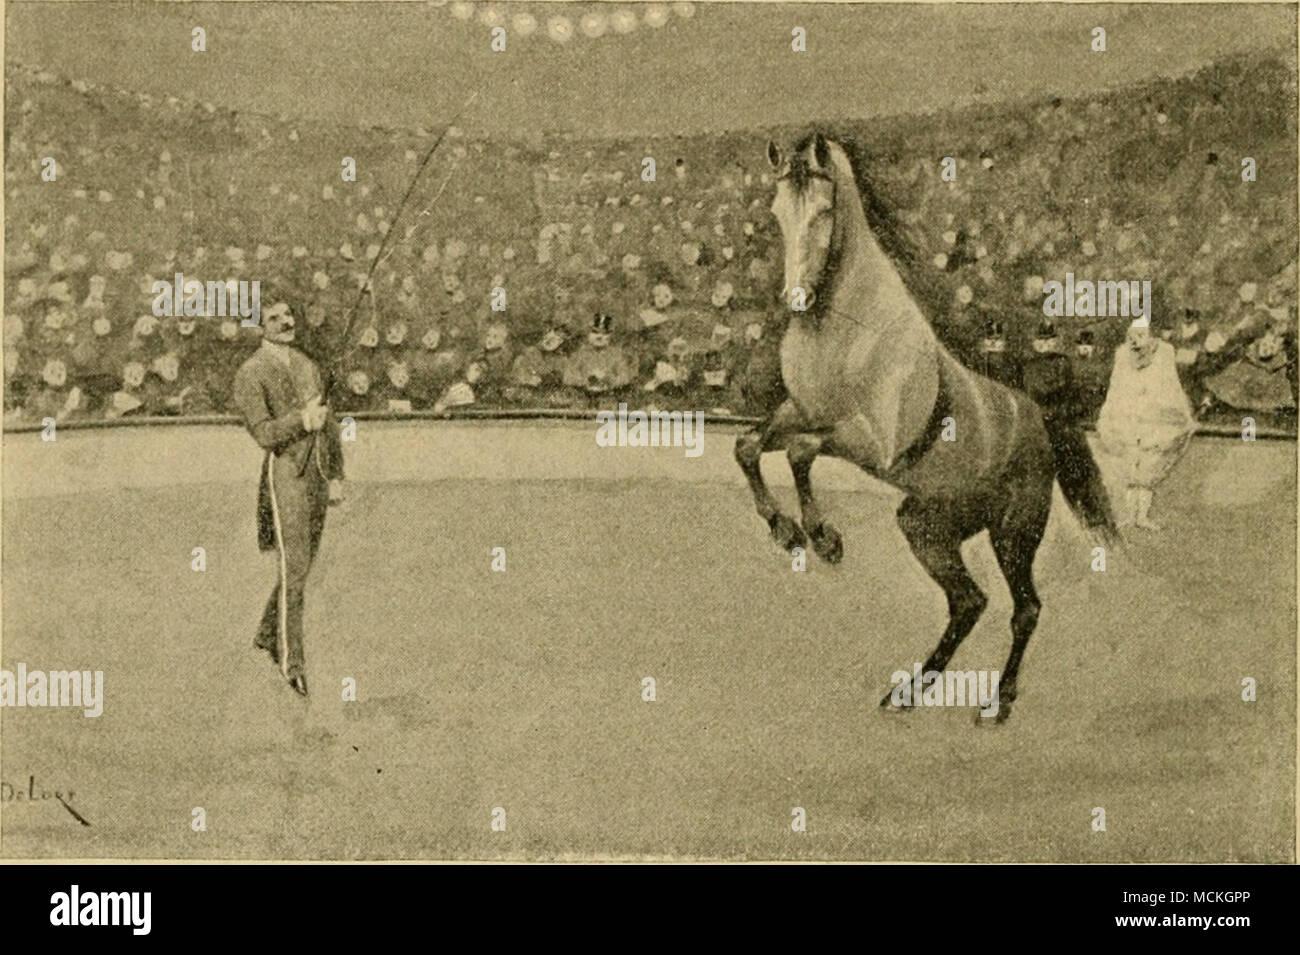 For Third Circus Stockfotos & For Third Circus Bilder - Alamy